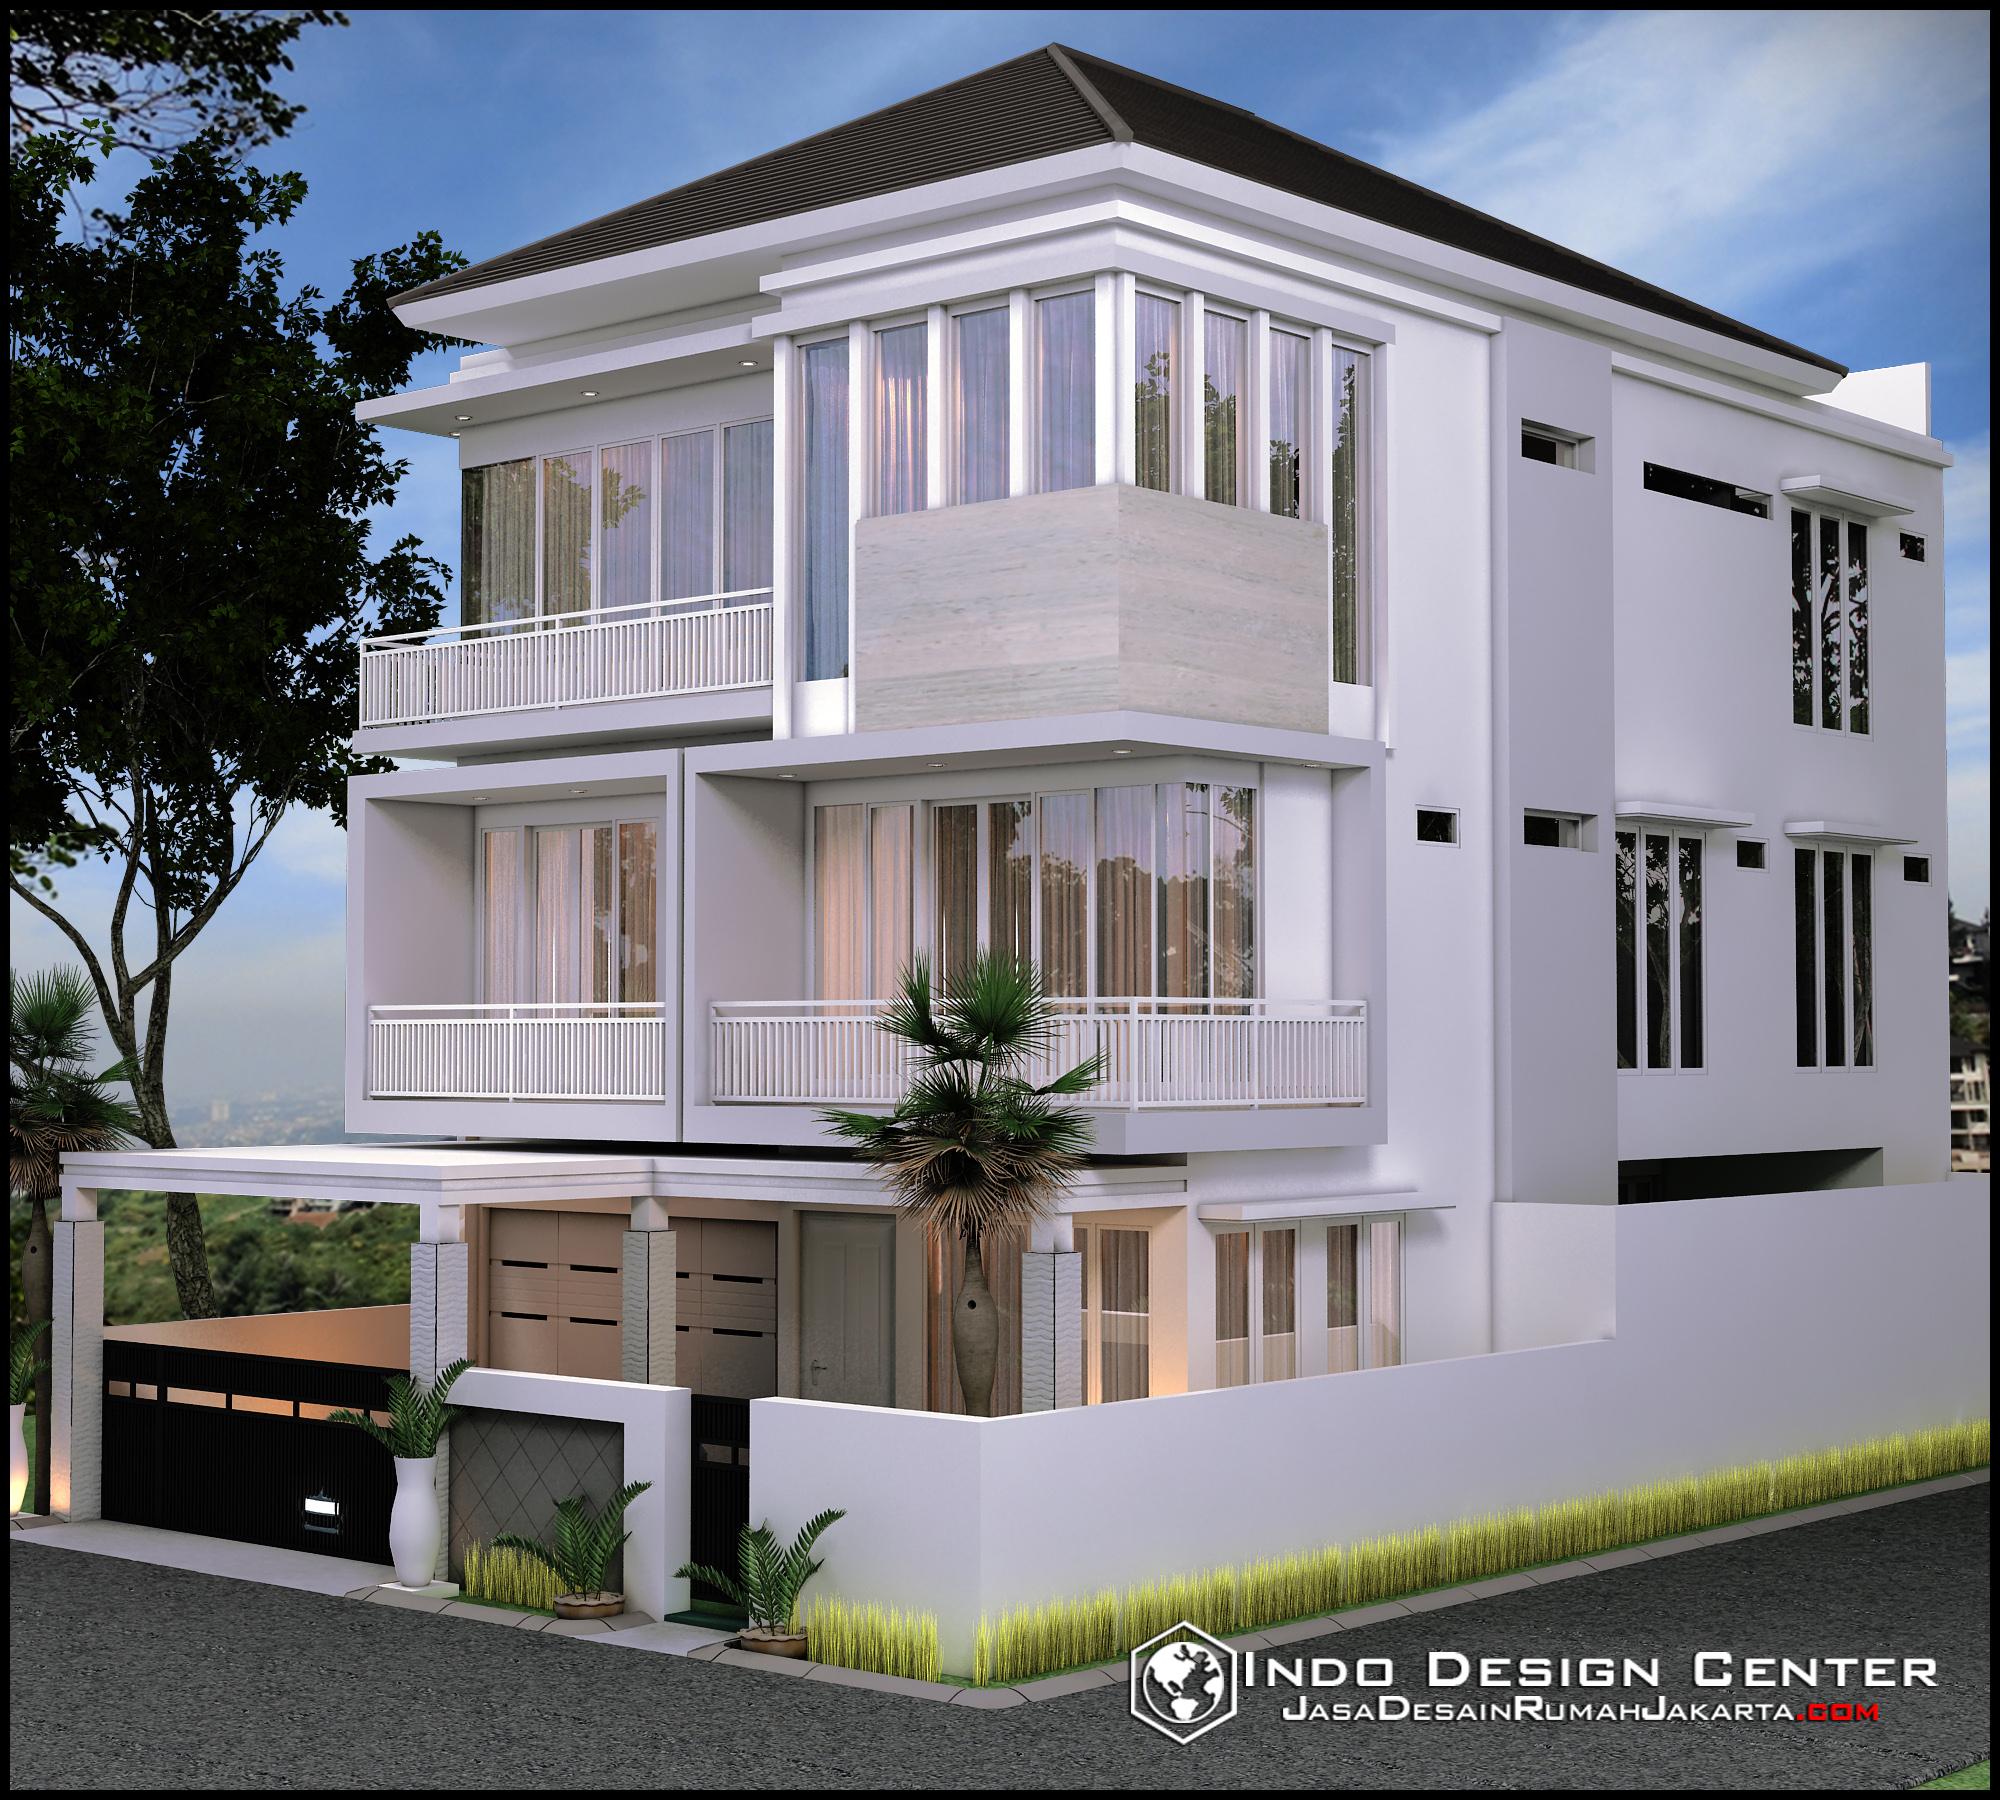 Gambar Rumah Minimalis Modern, Jasa Desain Rumah Jakarta